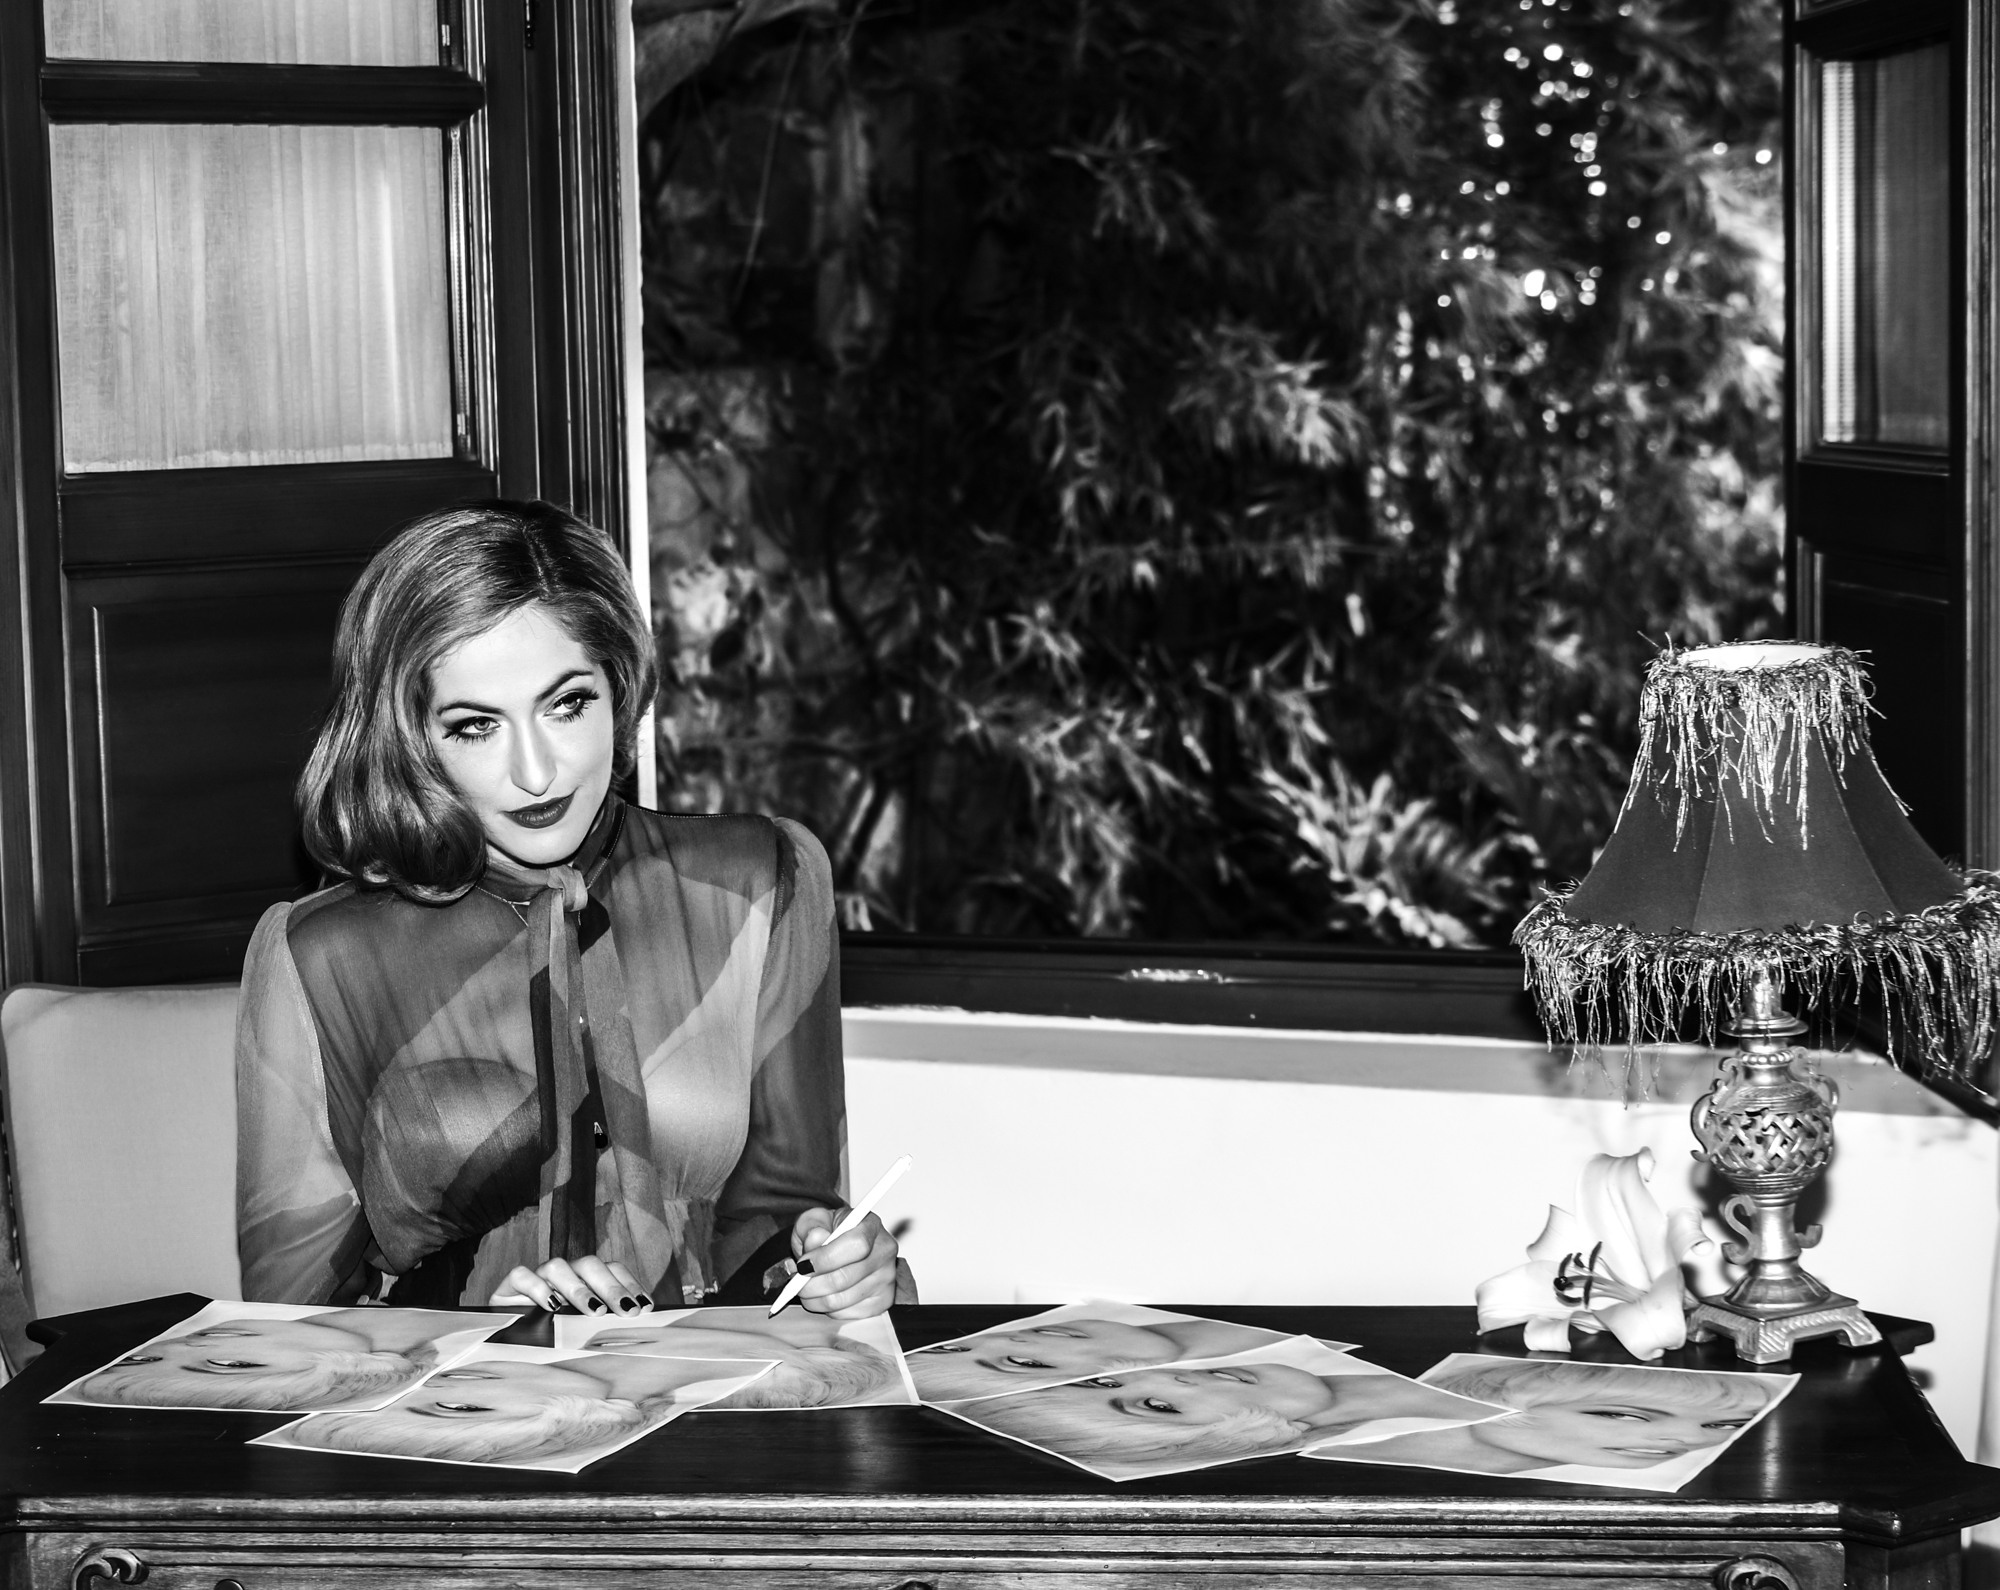 Mittie Babette Roger San Miguel de Allende